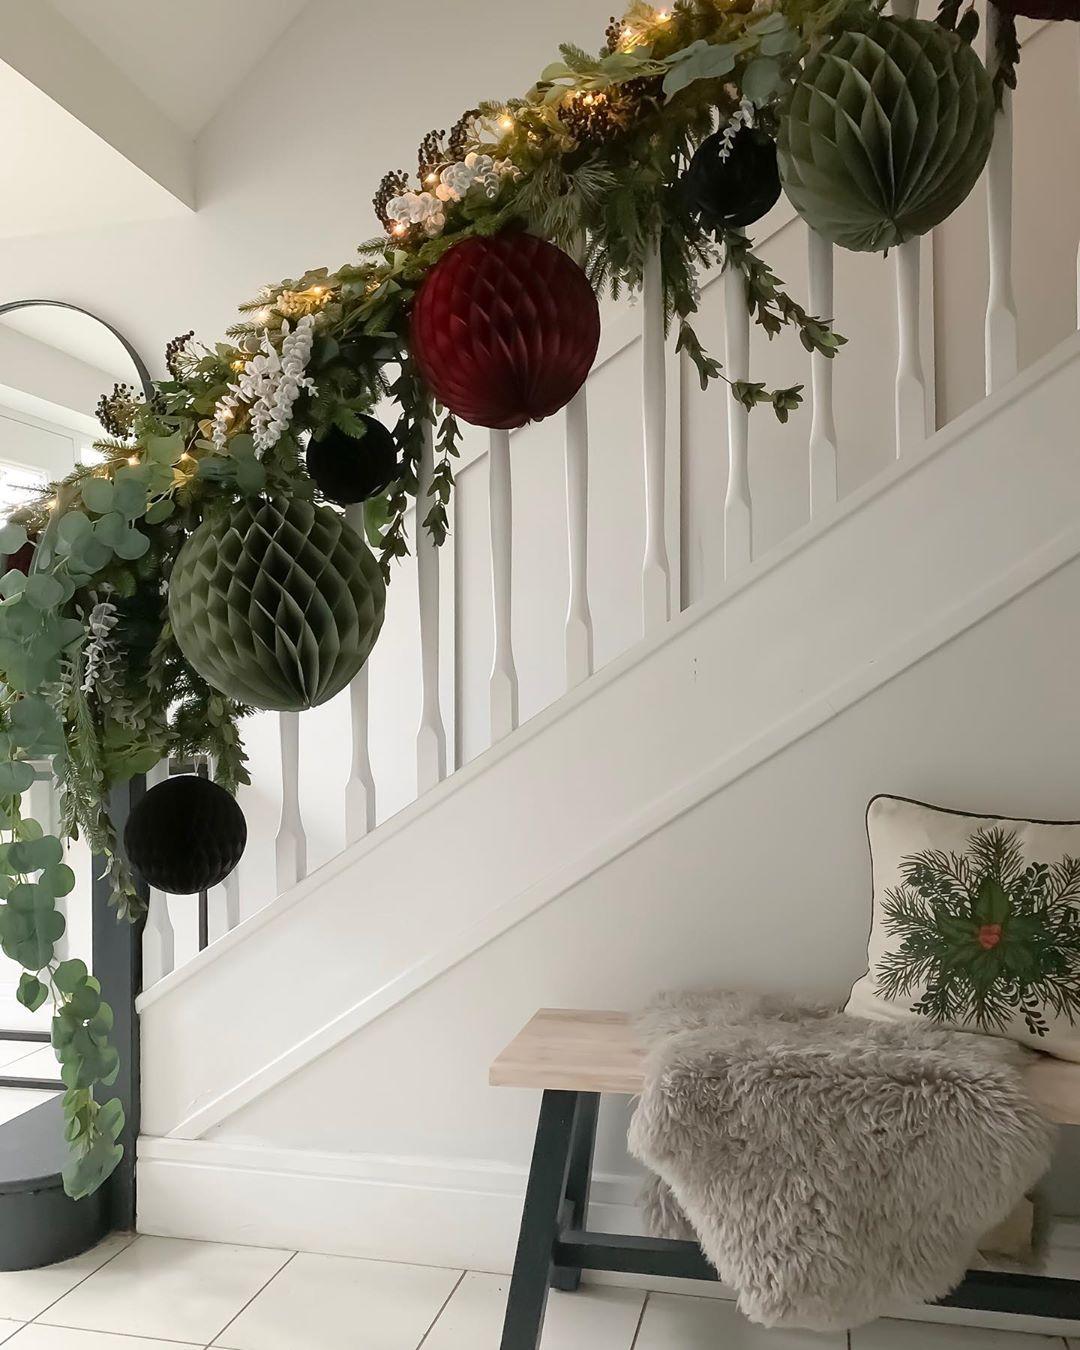 I'Ve Got The Main Tree Out The Attic Rea Festive - Diy Home Decor